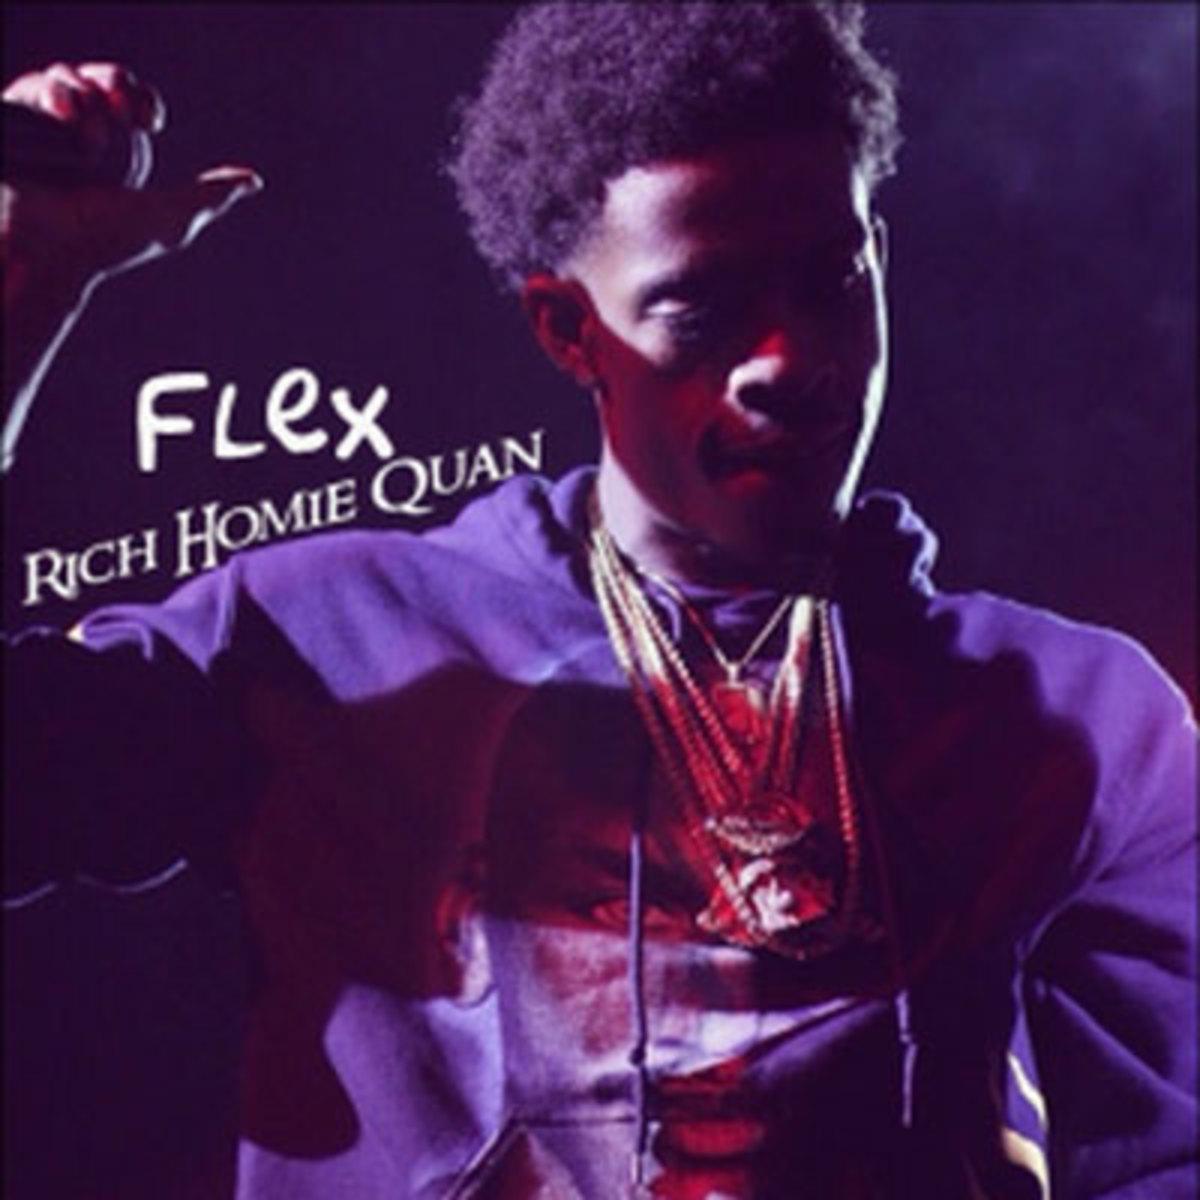 richhomiequan-flex.jpg